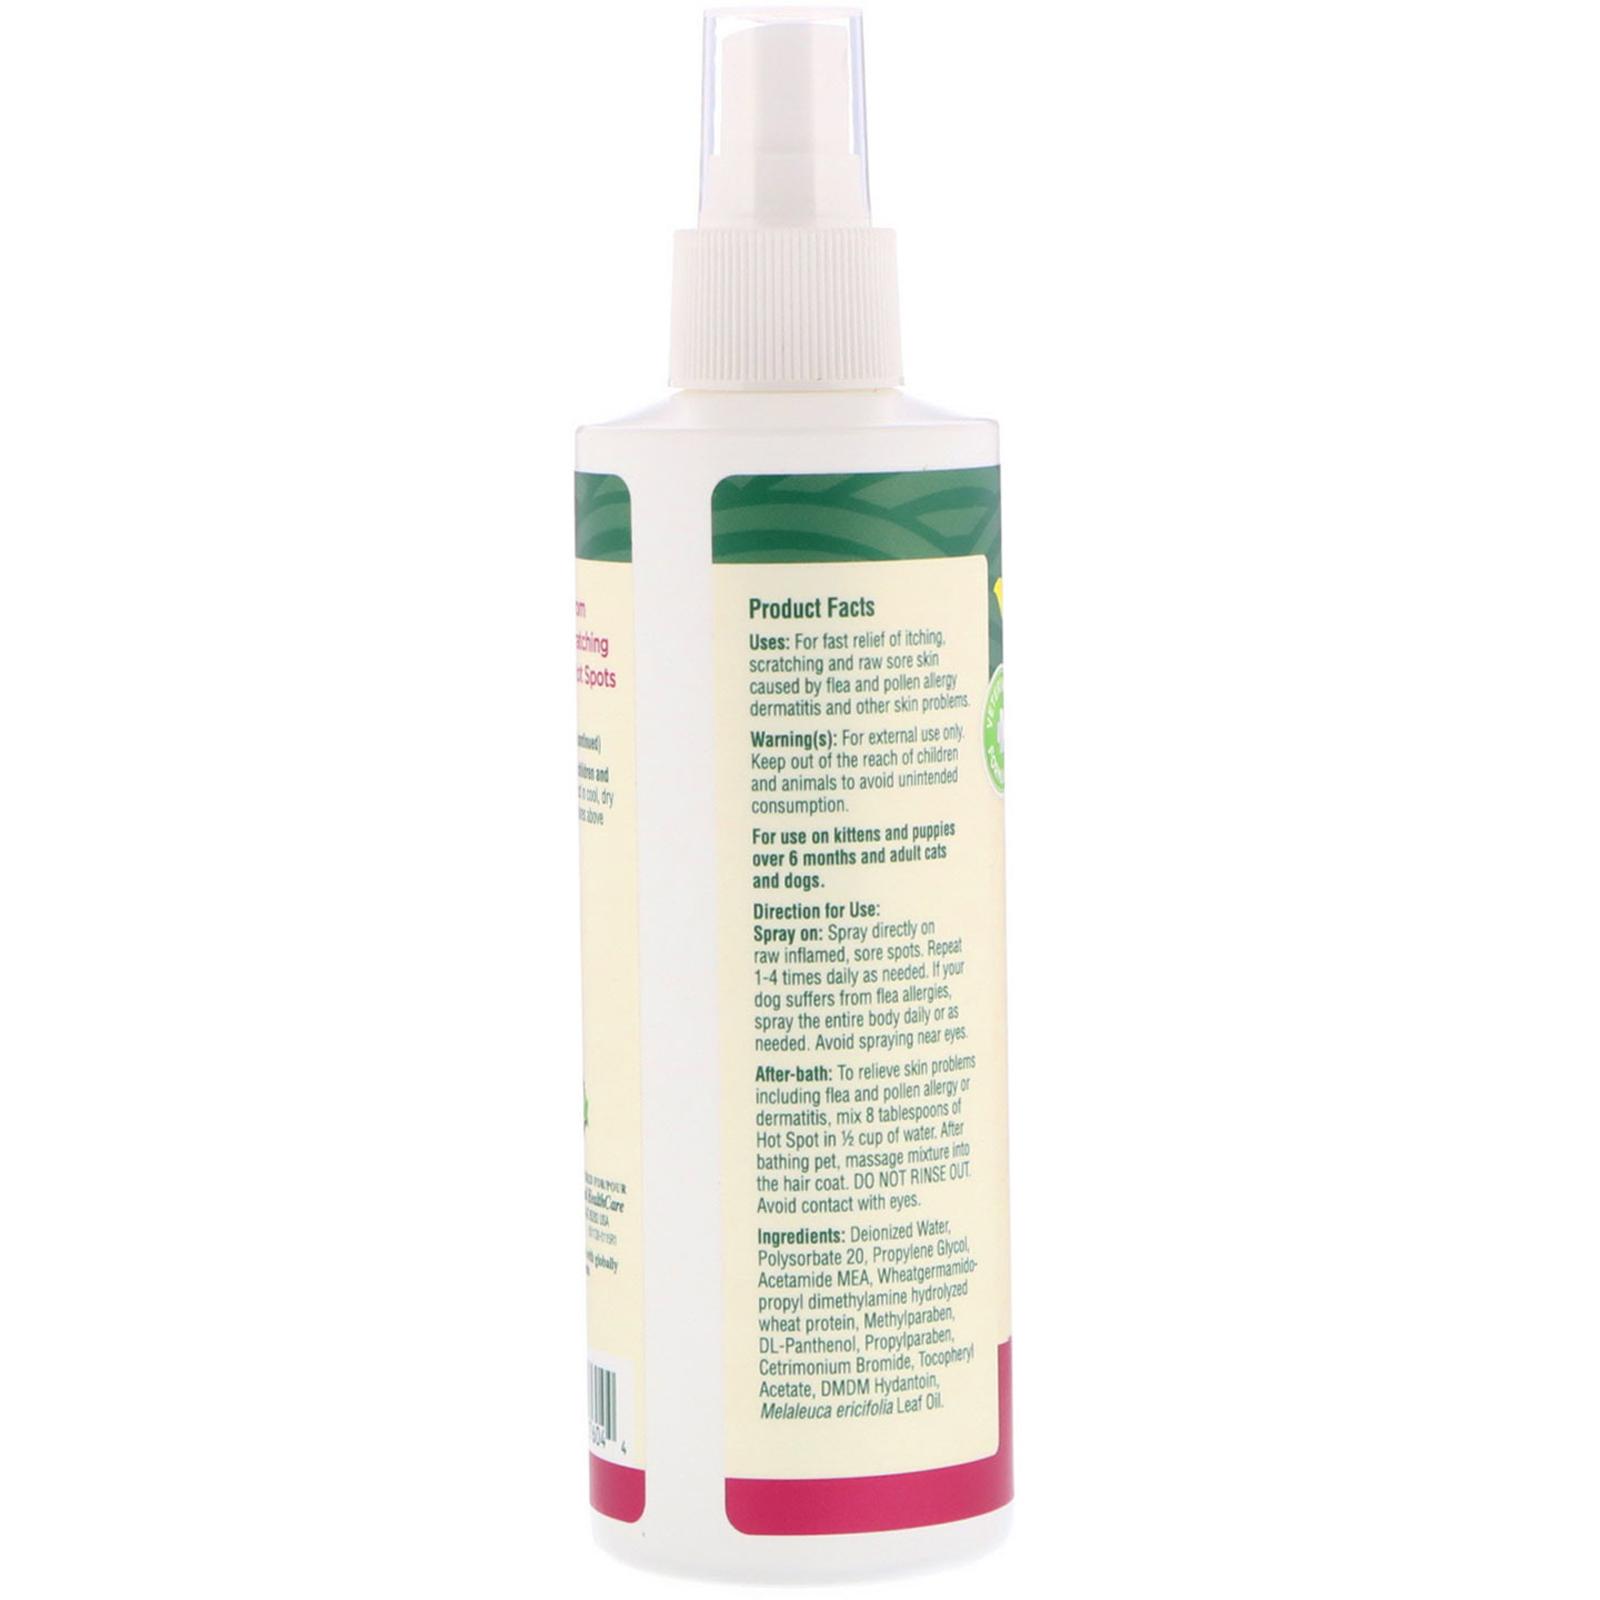 petnc NATURAL CARE, Hot Spot Spray, All Pet, 8 fl oz (237 ml